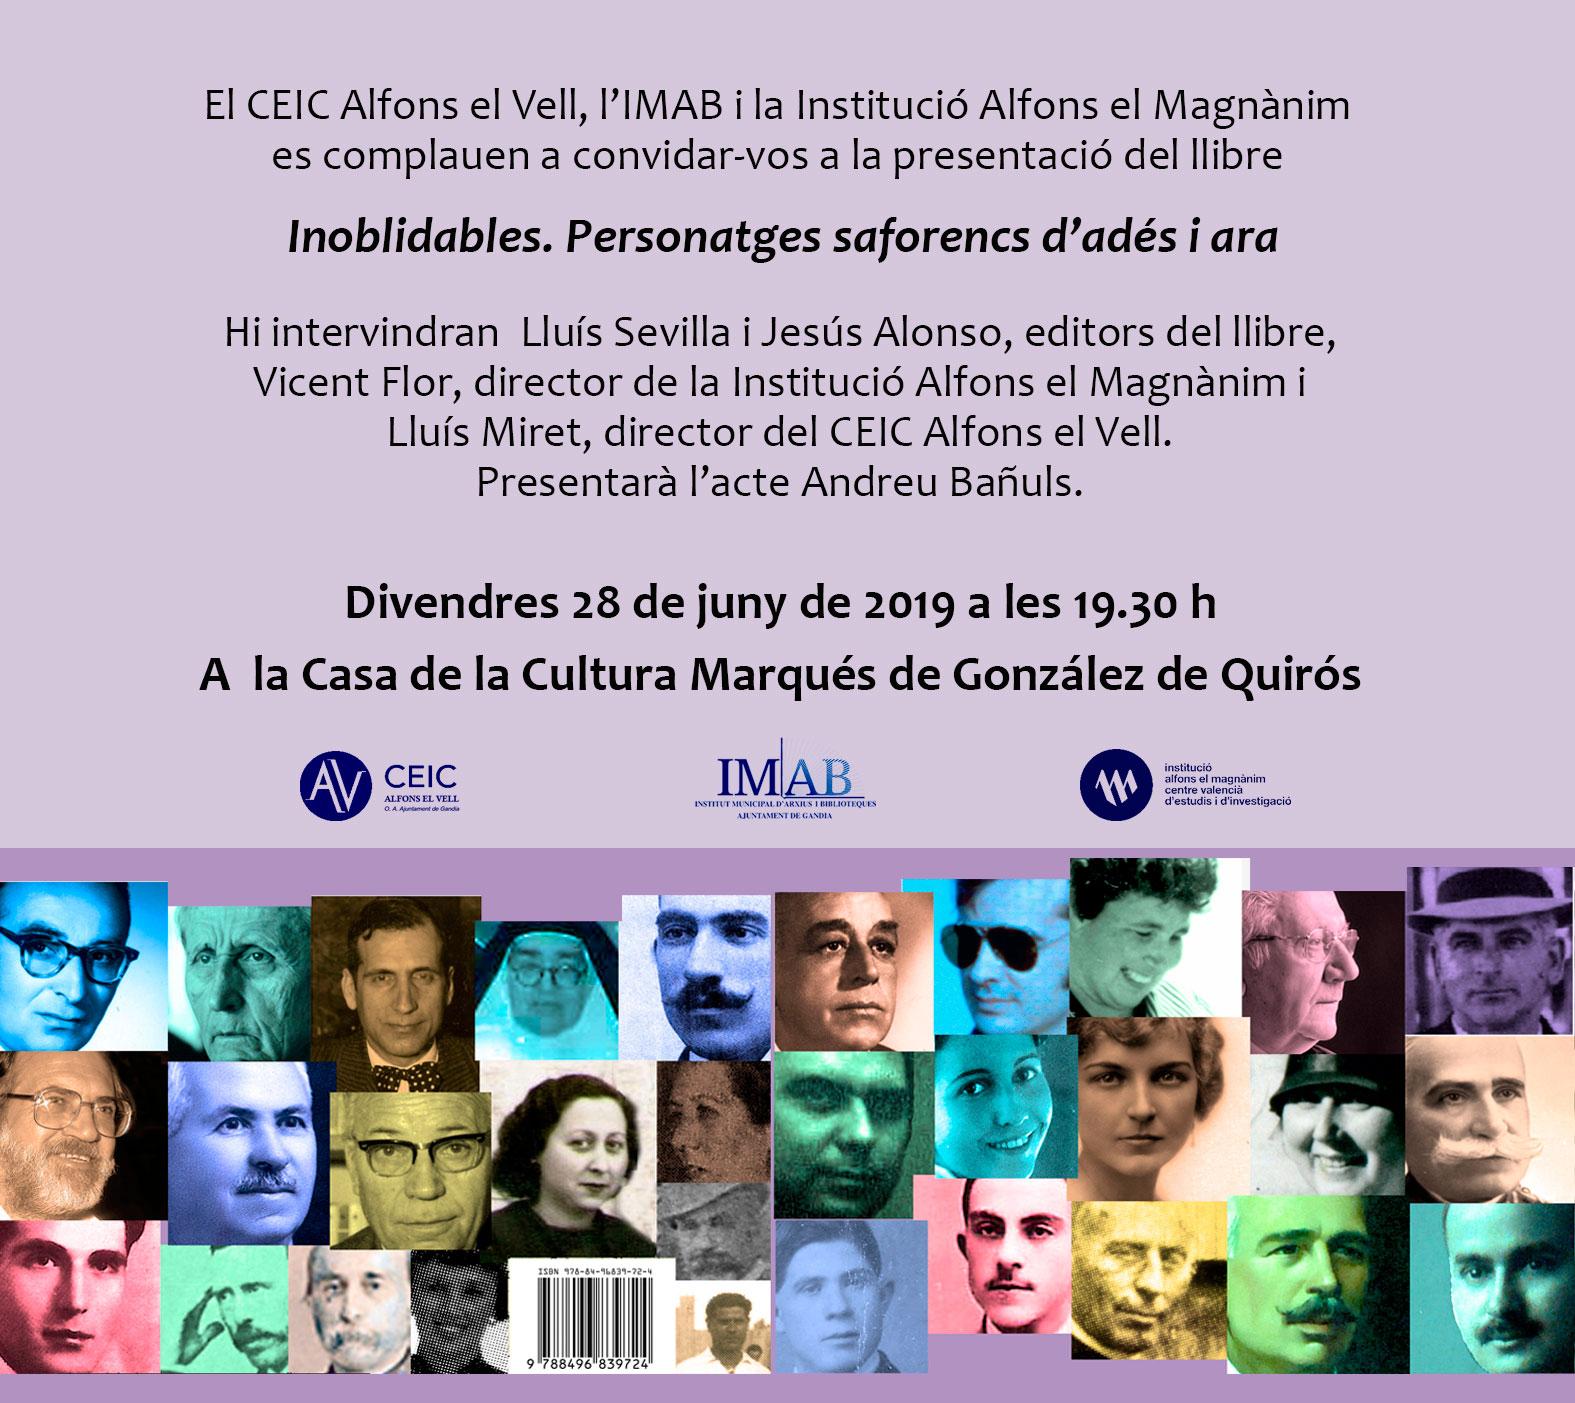 Tarja-inoblidables22